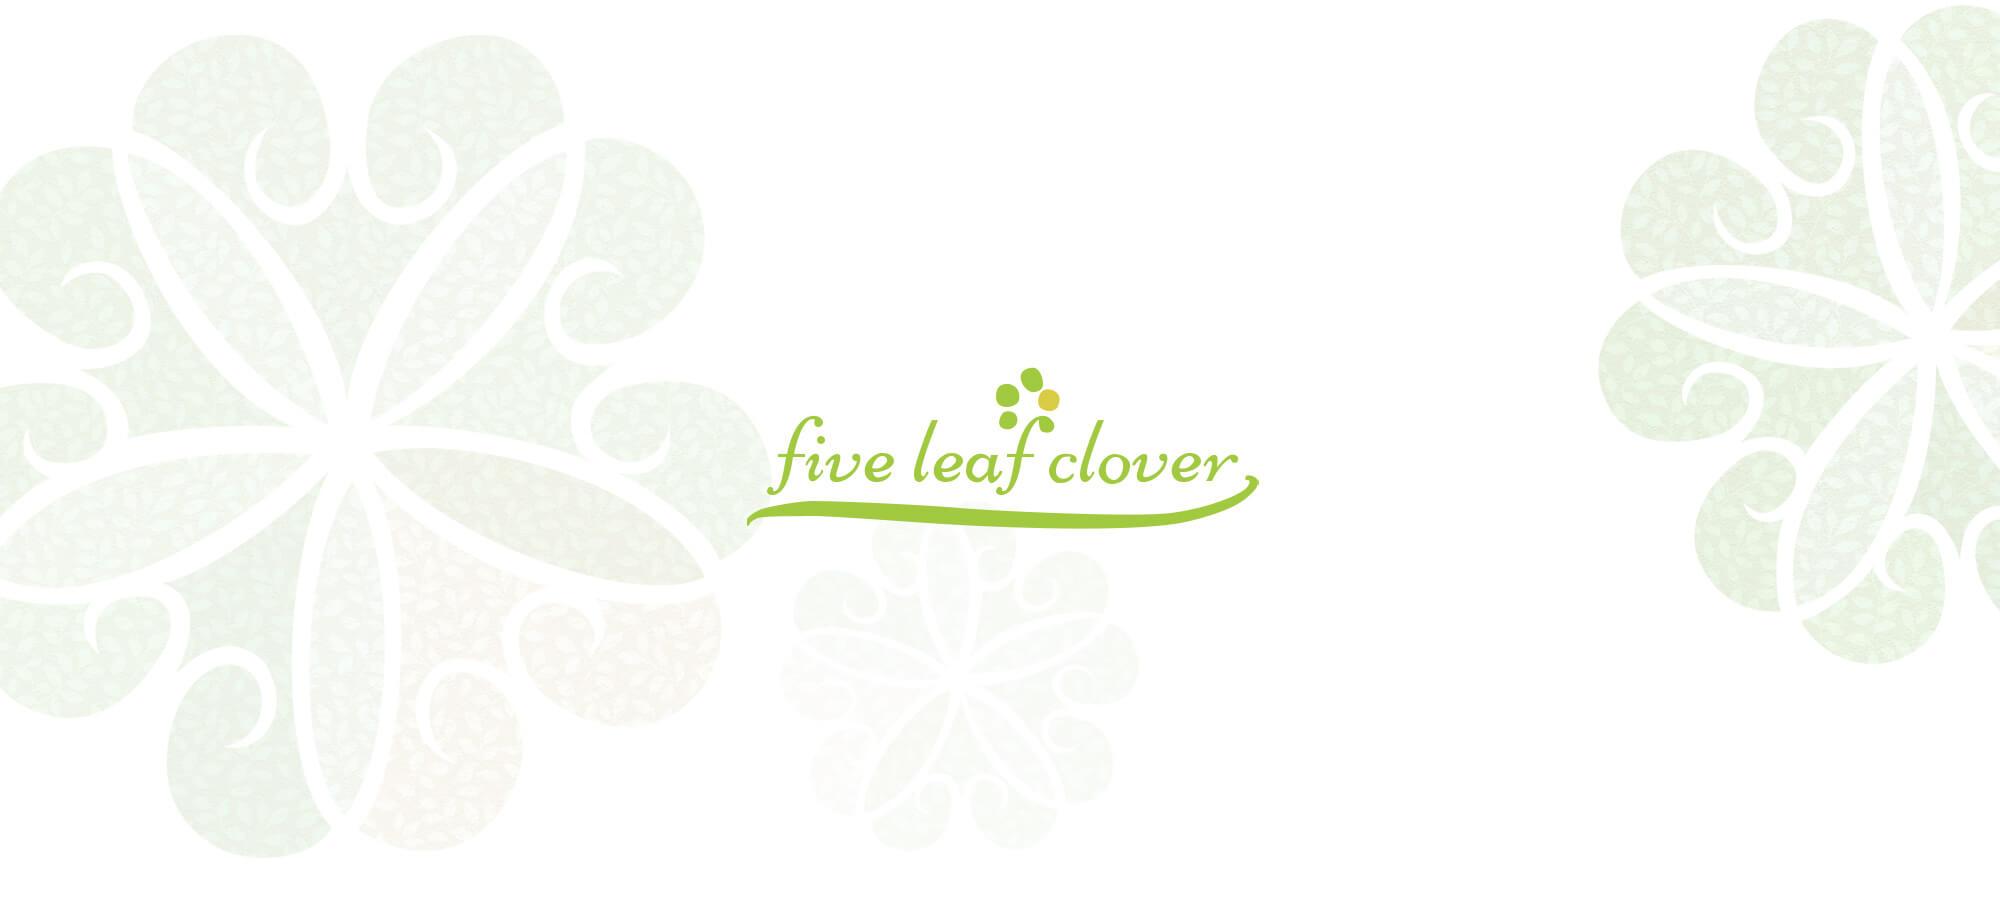 five leaf clover株式会社